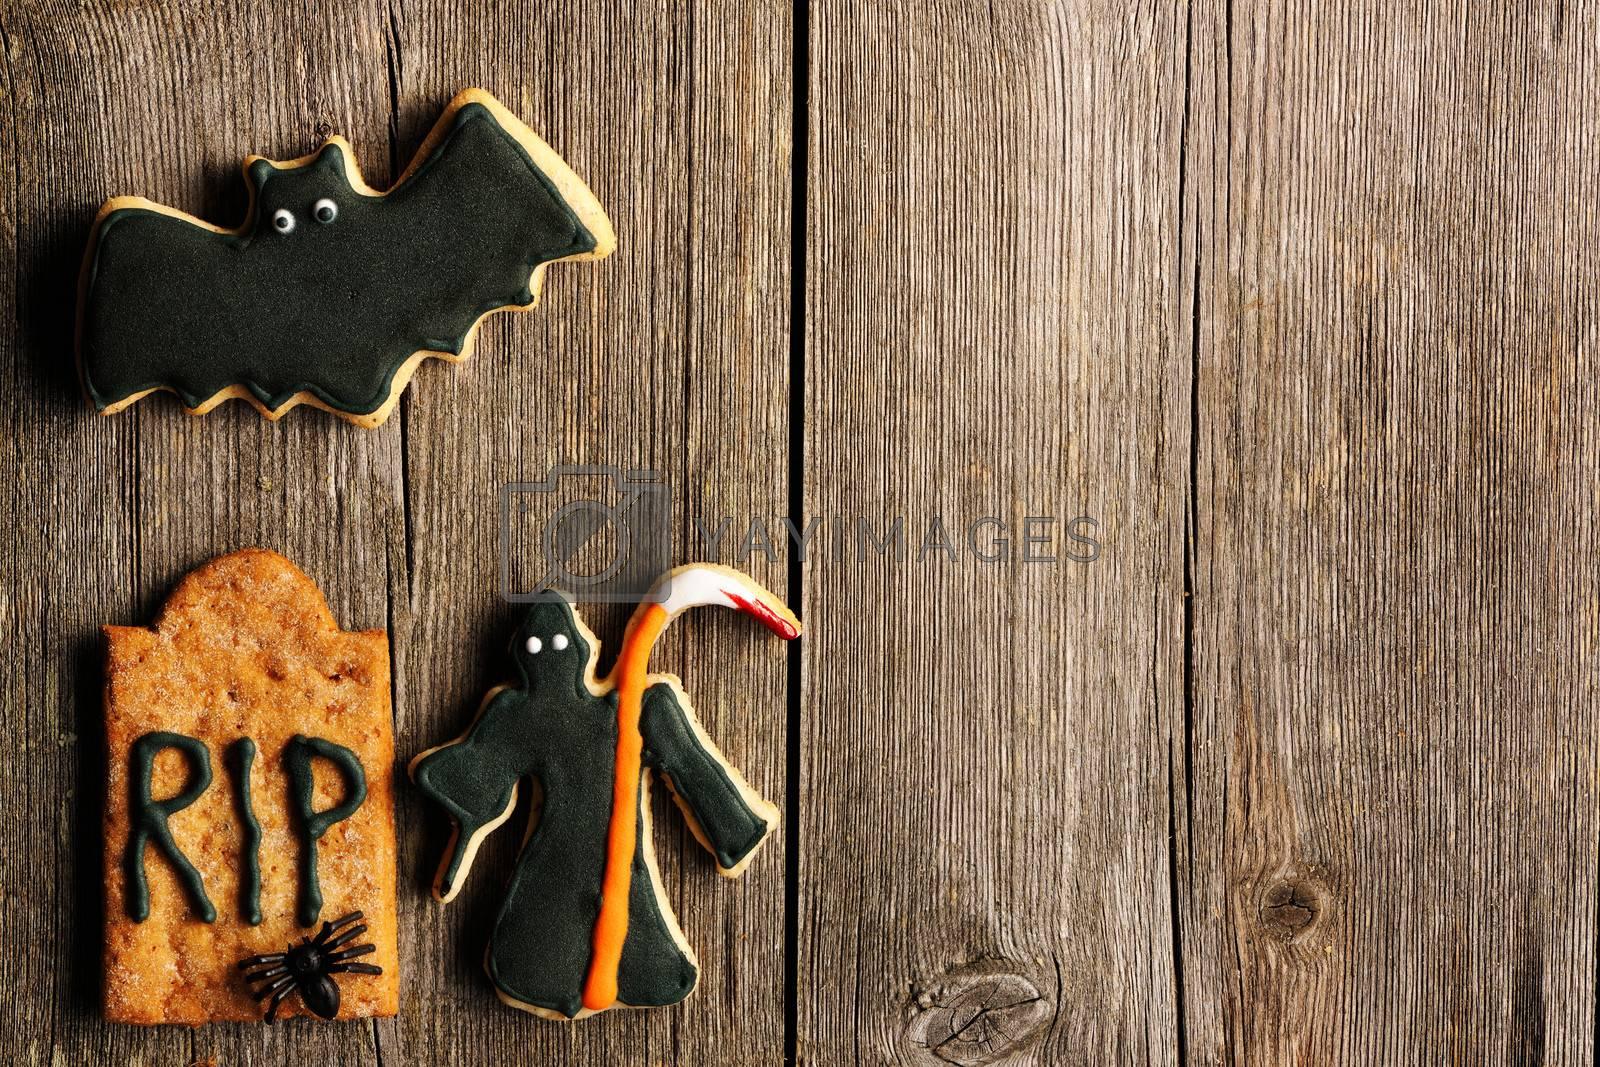 Halloween homemade gingerbread cookies over wooden table